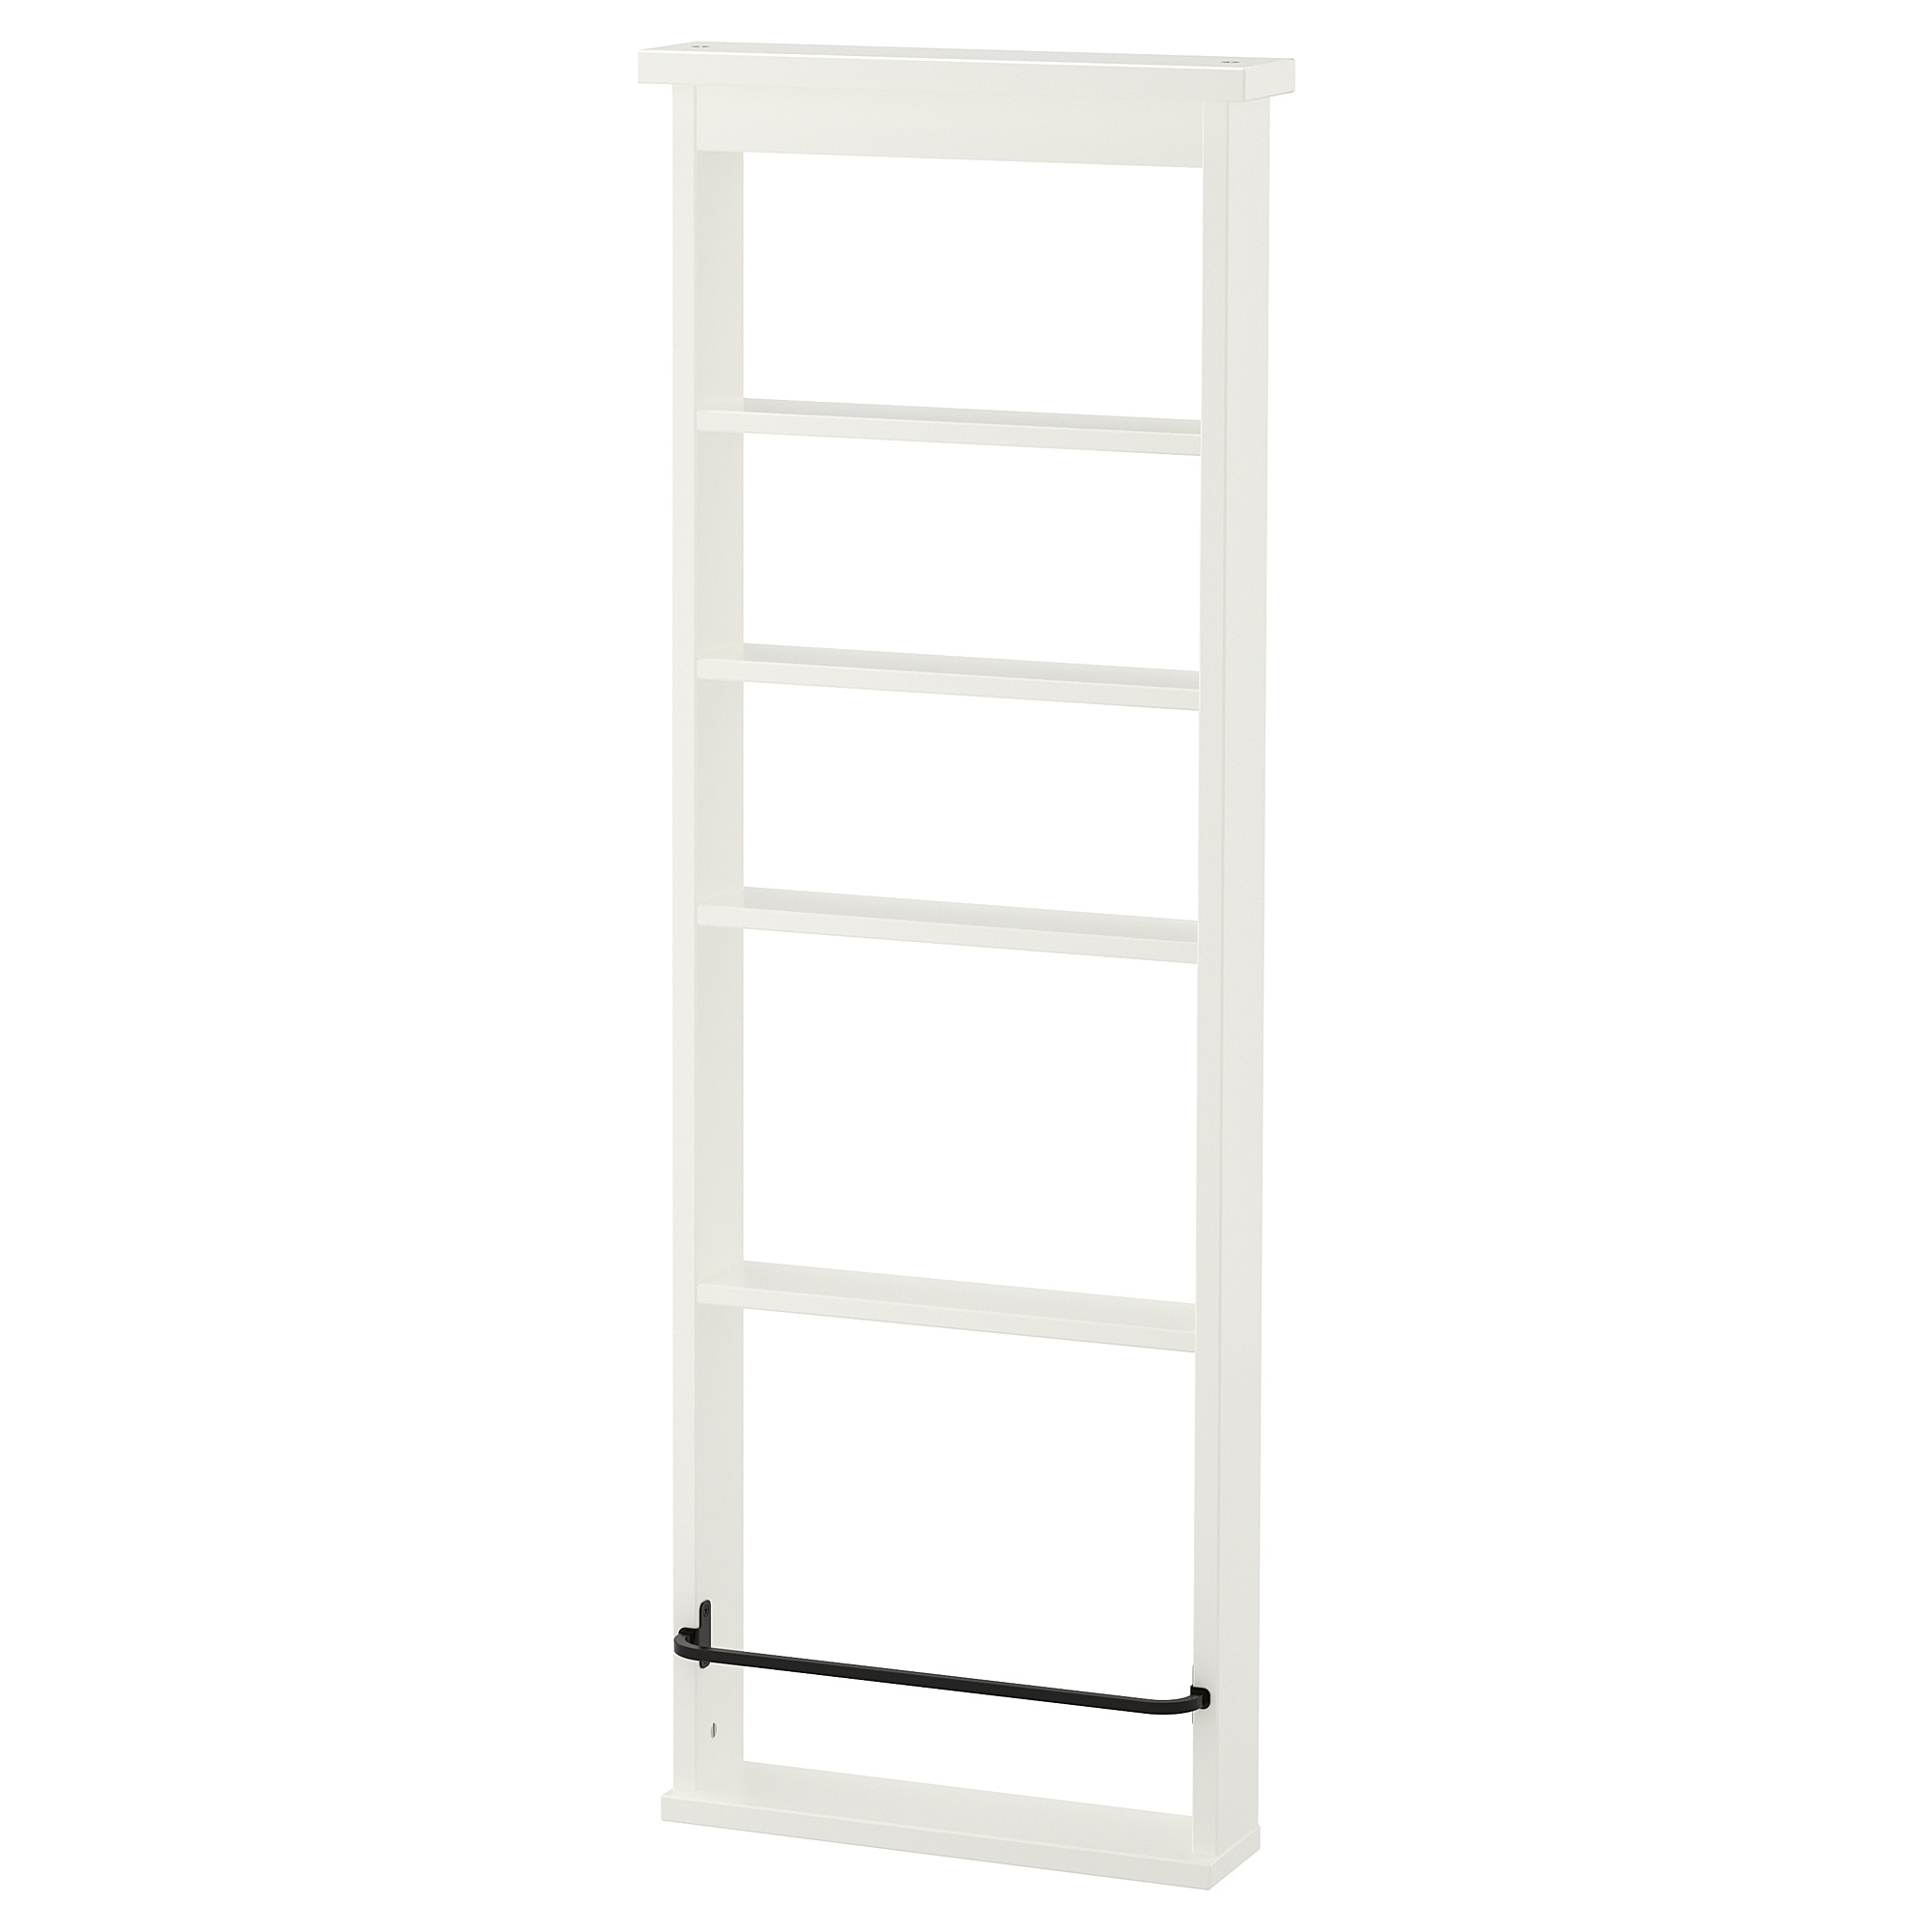 Hemnes Wall Shelf